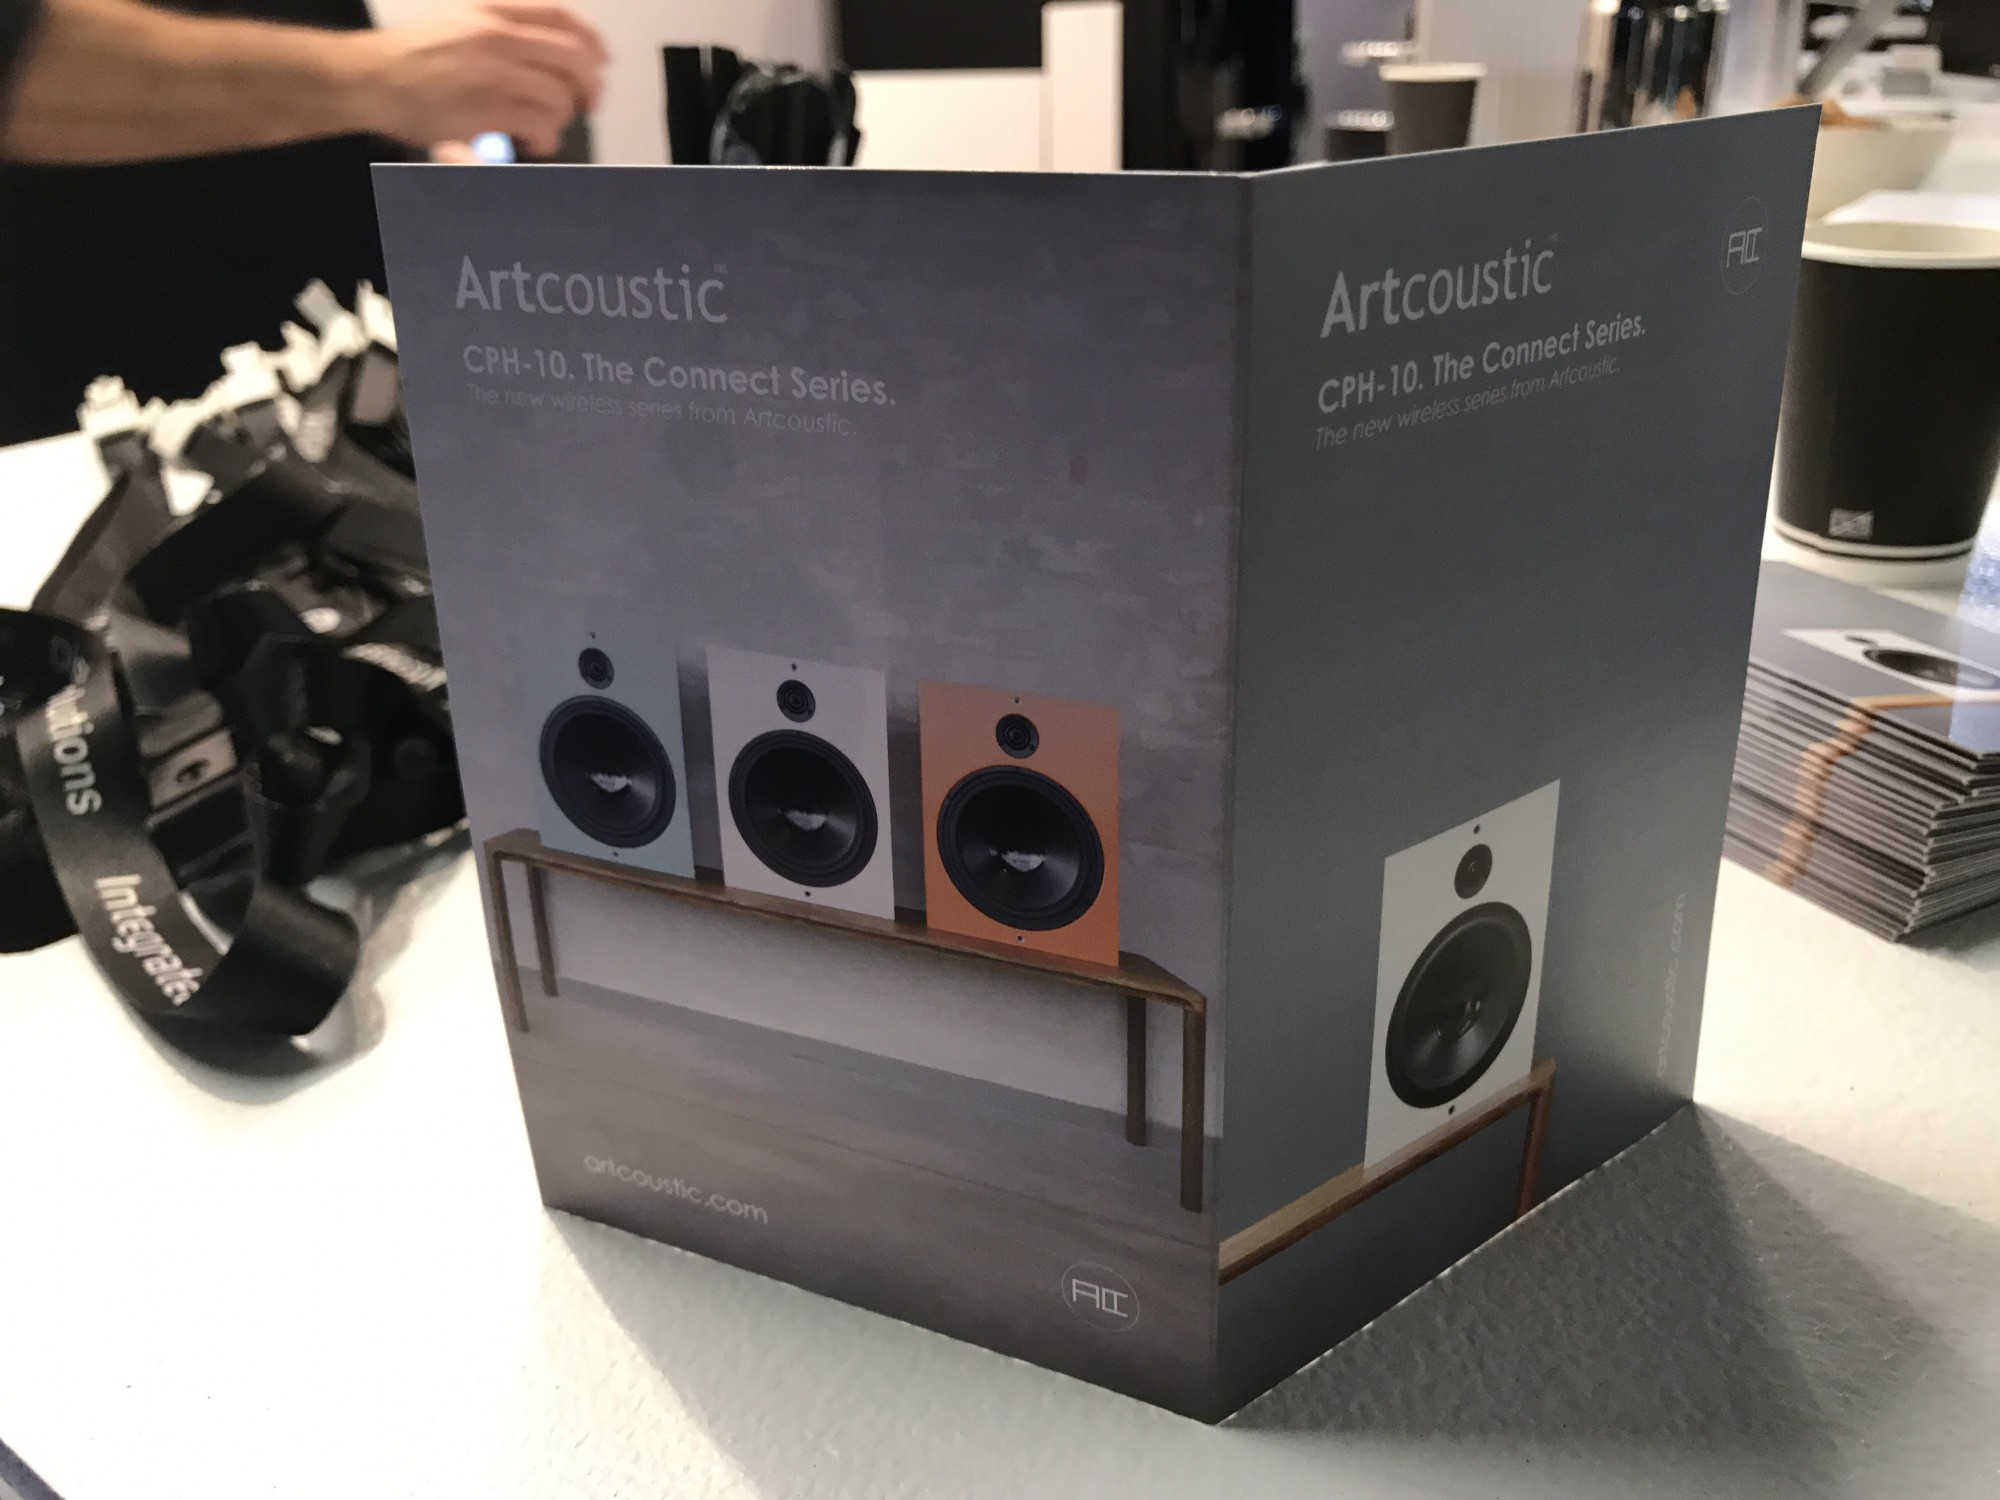 Enceintes Bluetooth artcoustic CPH-10